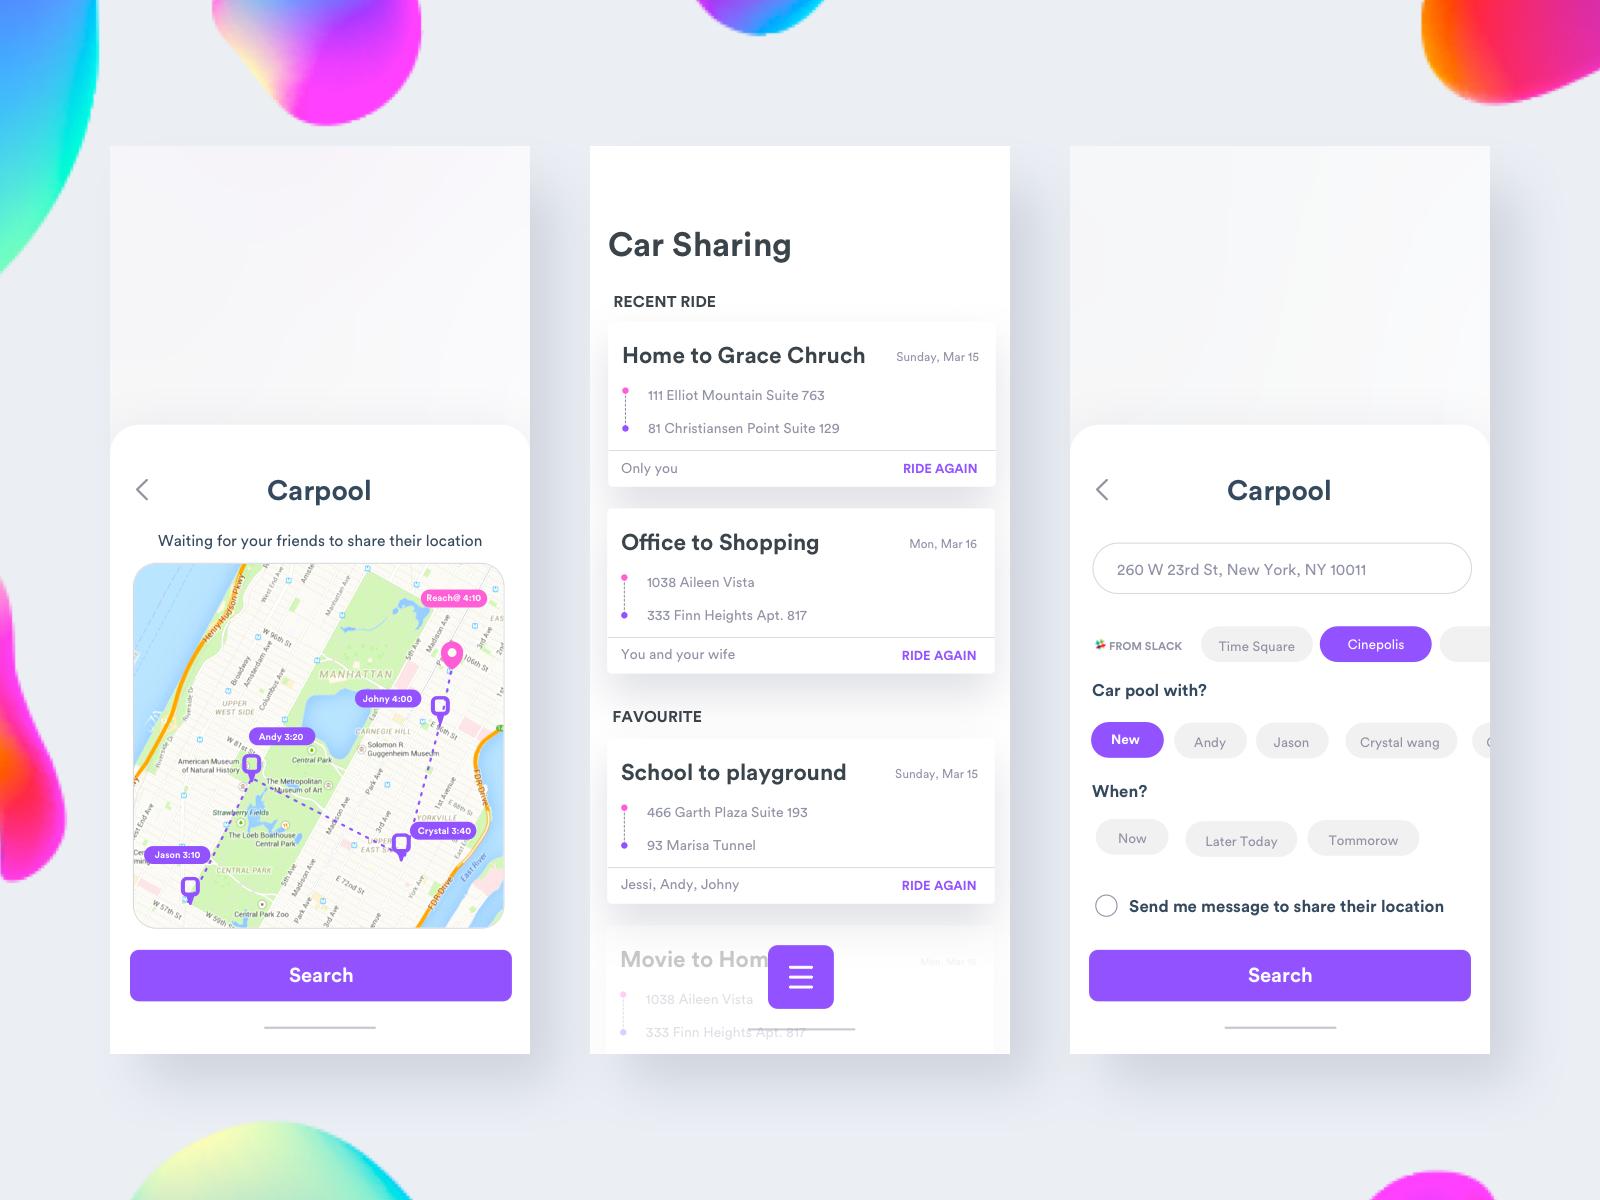 Car Sharing Uber Pool Ride Lyft Ui Redesign Recent App Ui 2x Uber